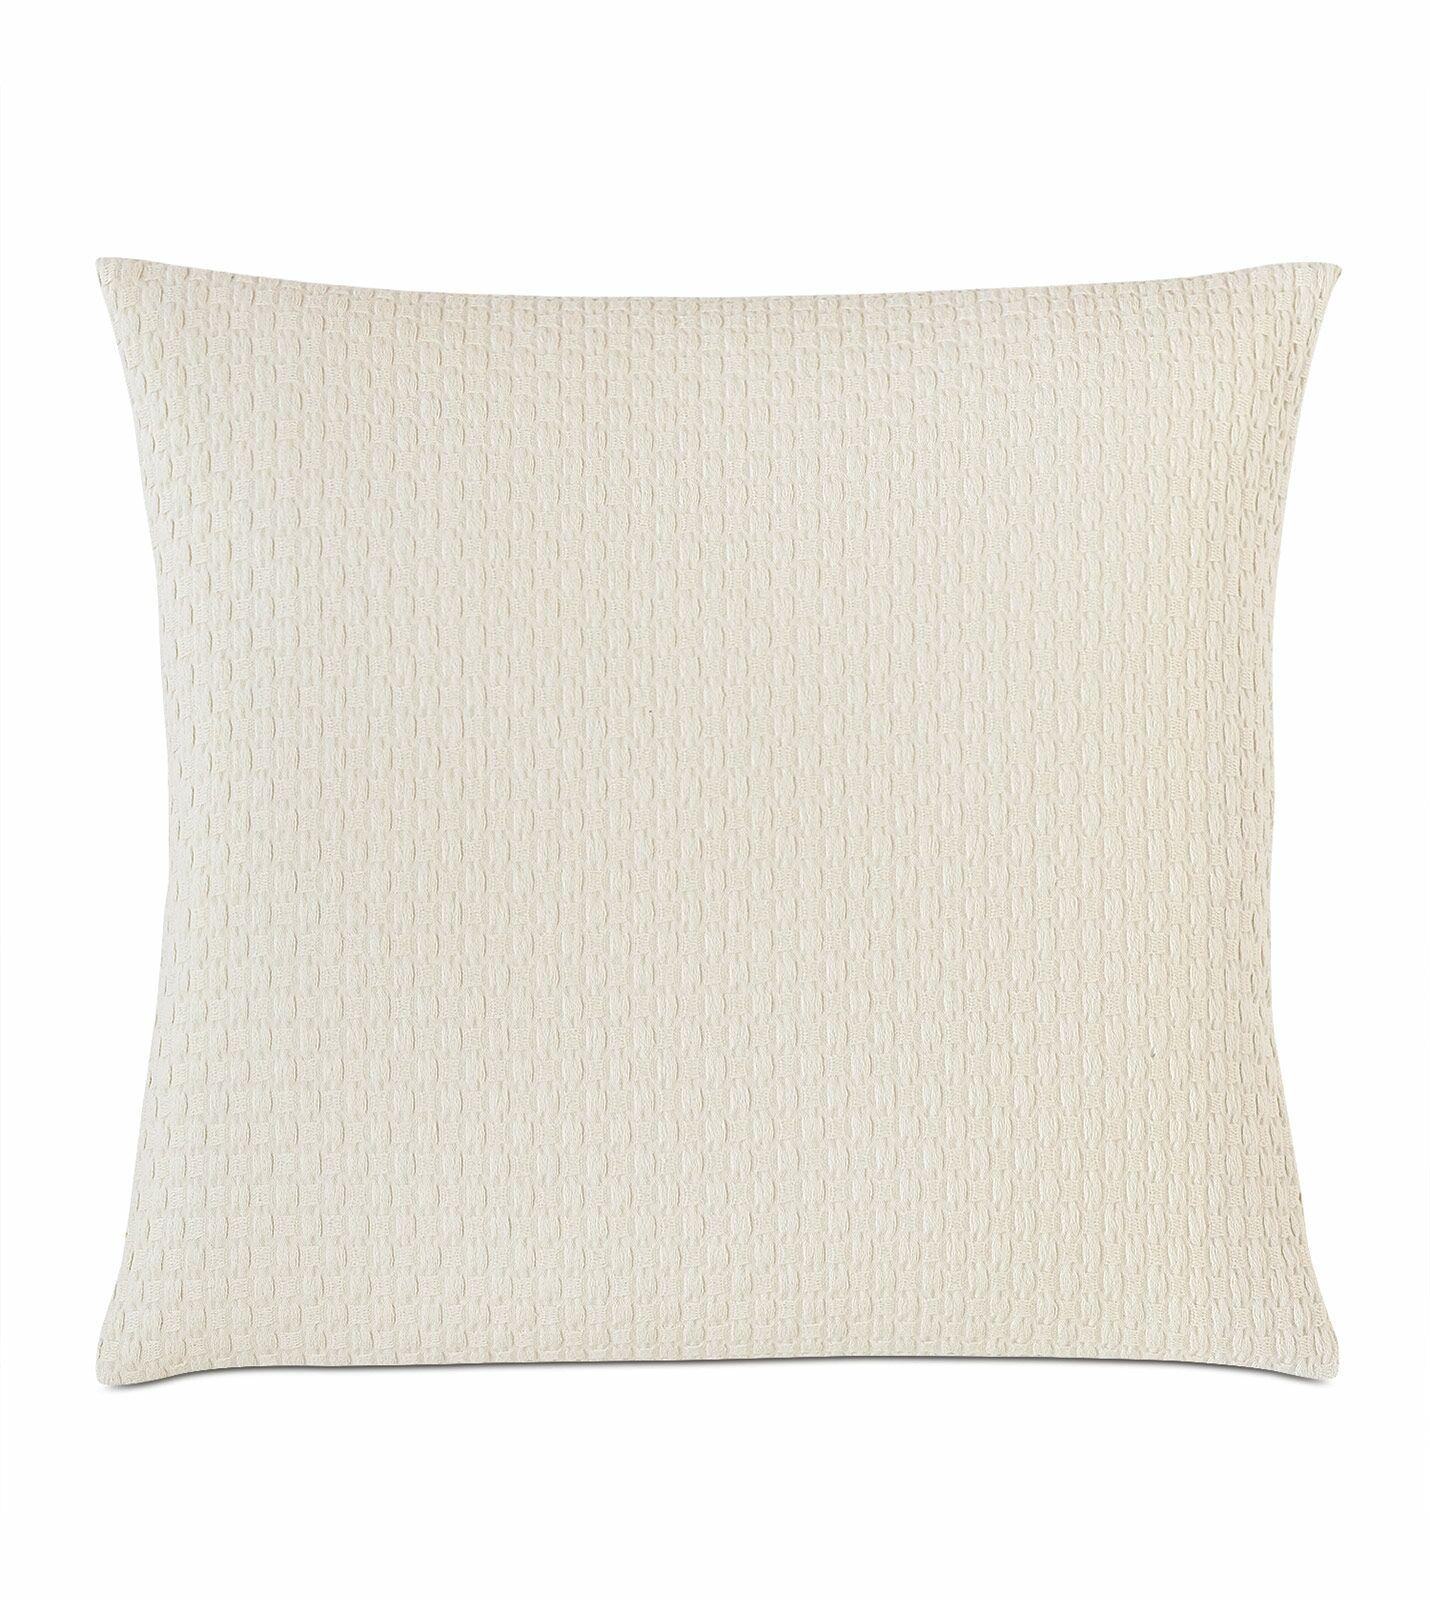 Akela Textured Matelasse Cotton Throw pillow Color: Ivory